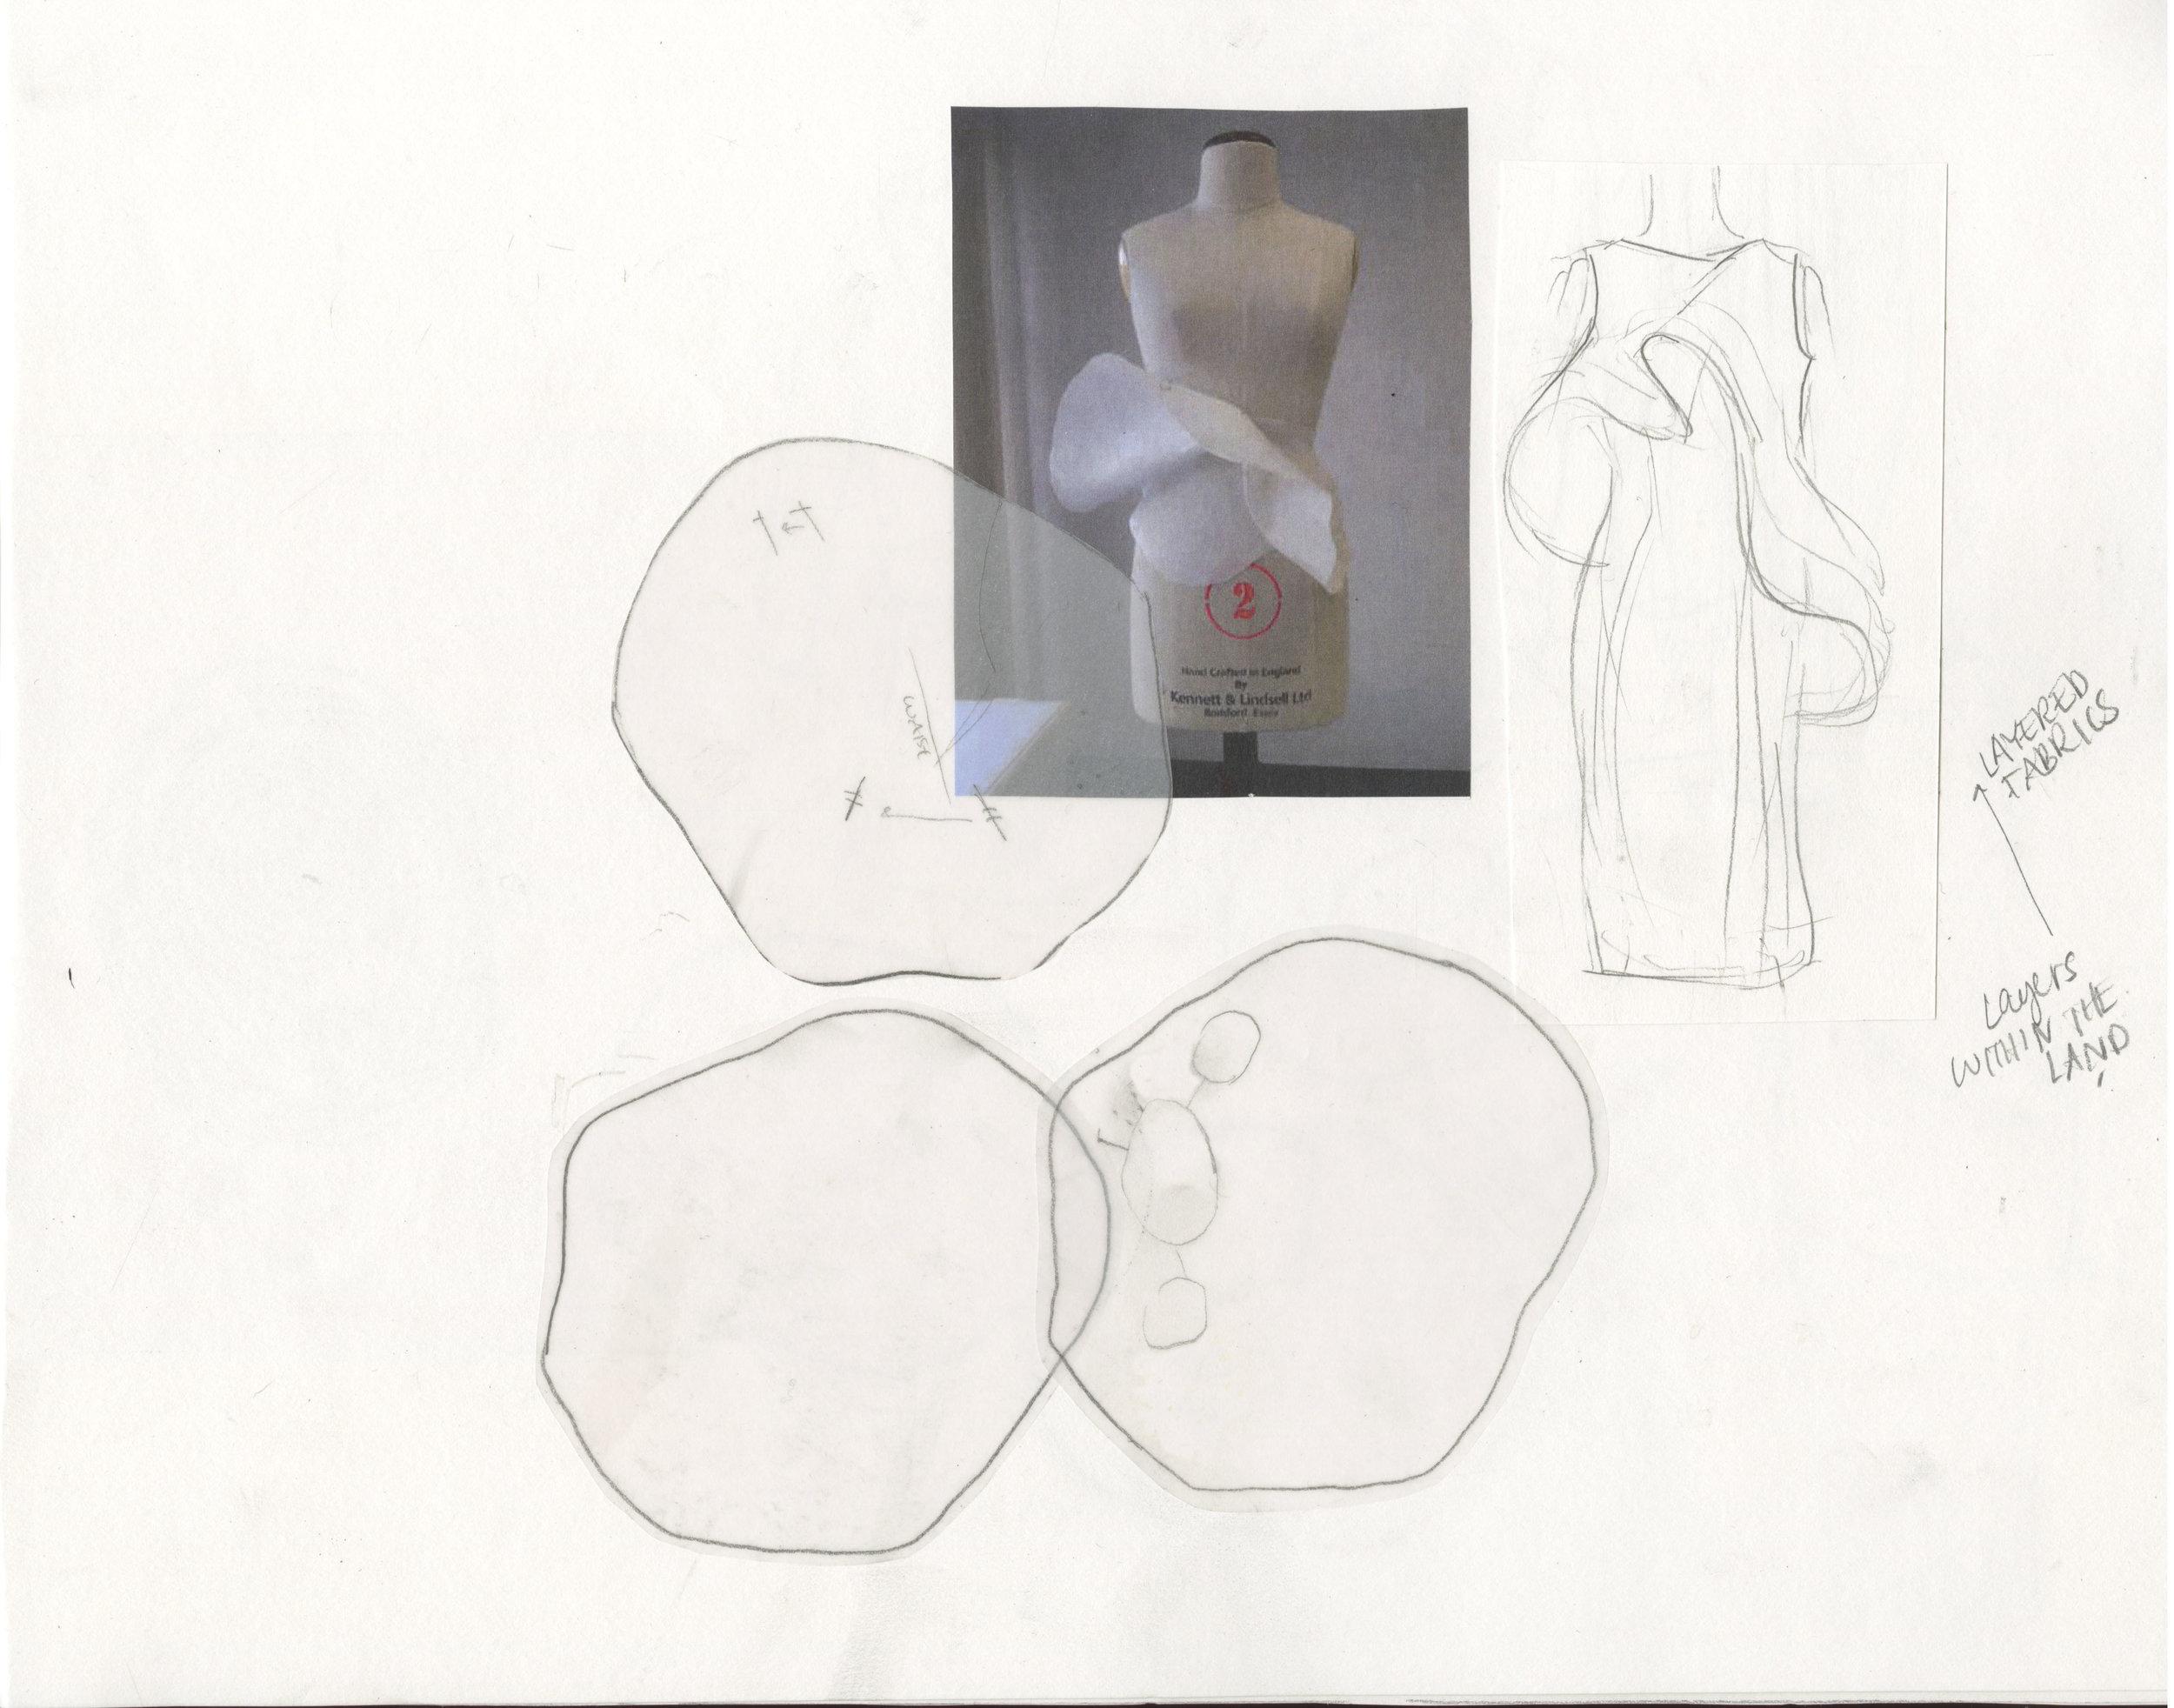 Scan 213.jpeg